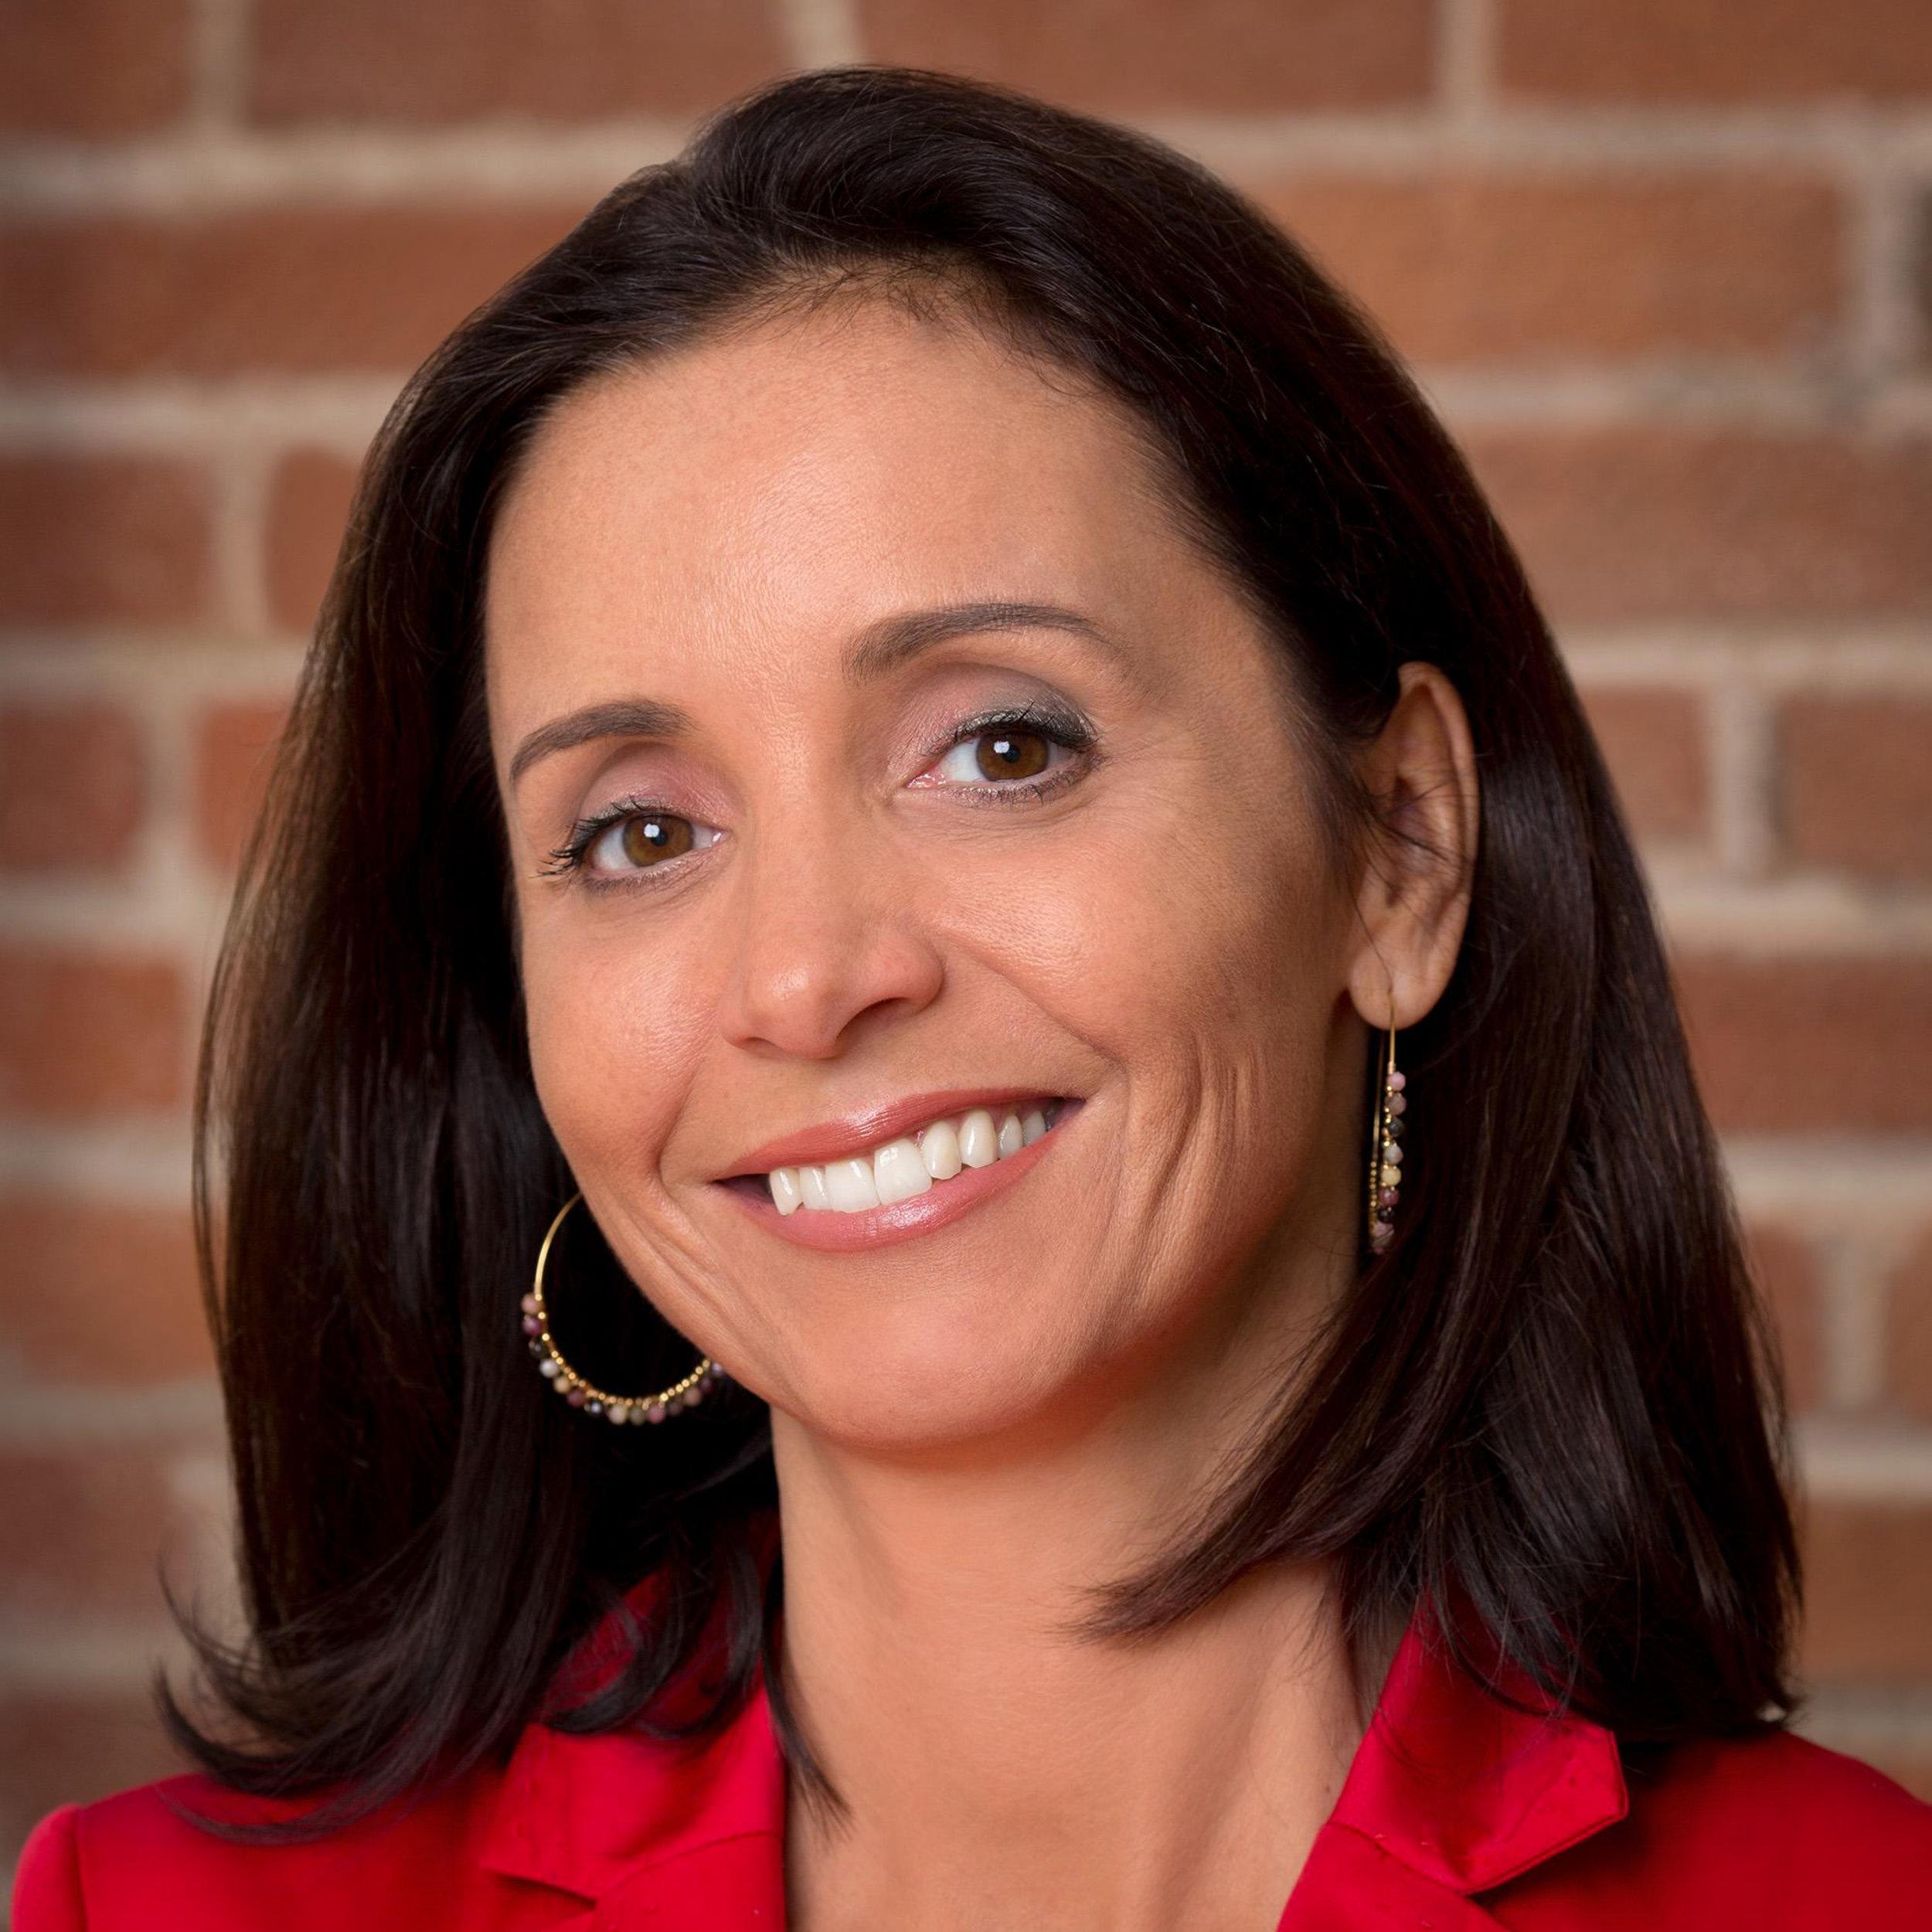 "<a href=""https://www.linkedin.com/in/geraldinelemeur"" target=""_blank""><i><b>Geraldine Le Meur</i></b></a><br>Co-Founder & <br>General Partner<br><b>The Refiners</b>"